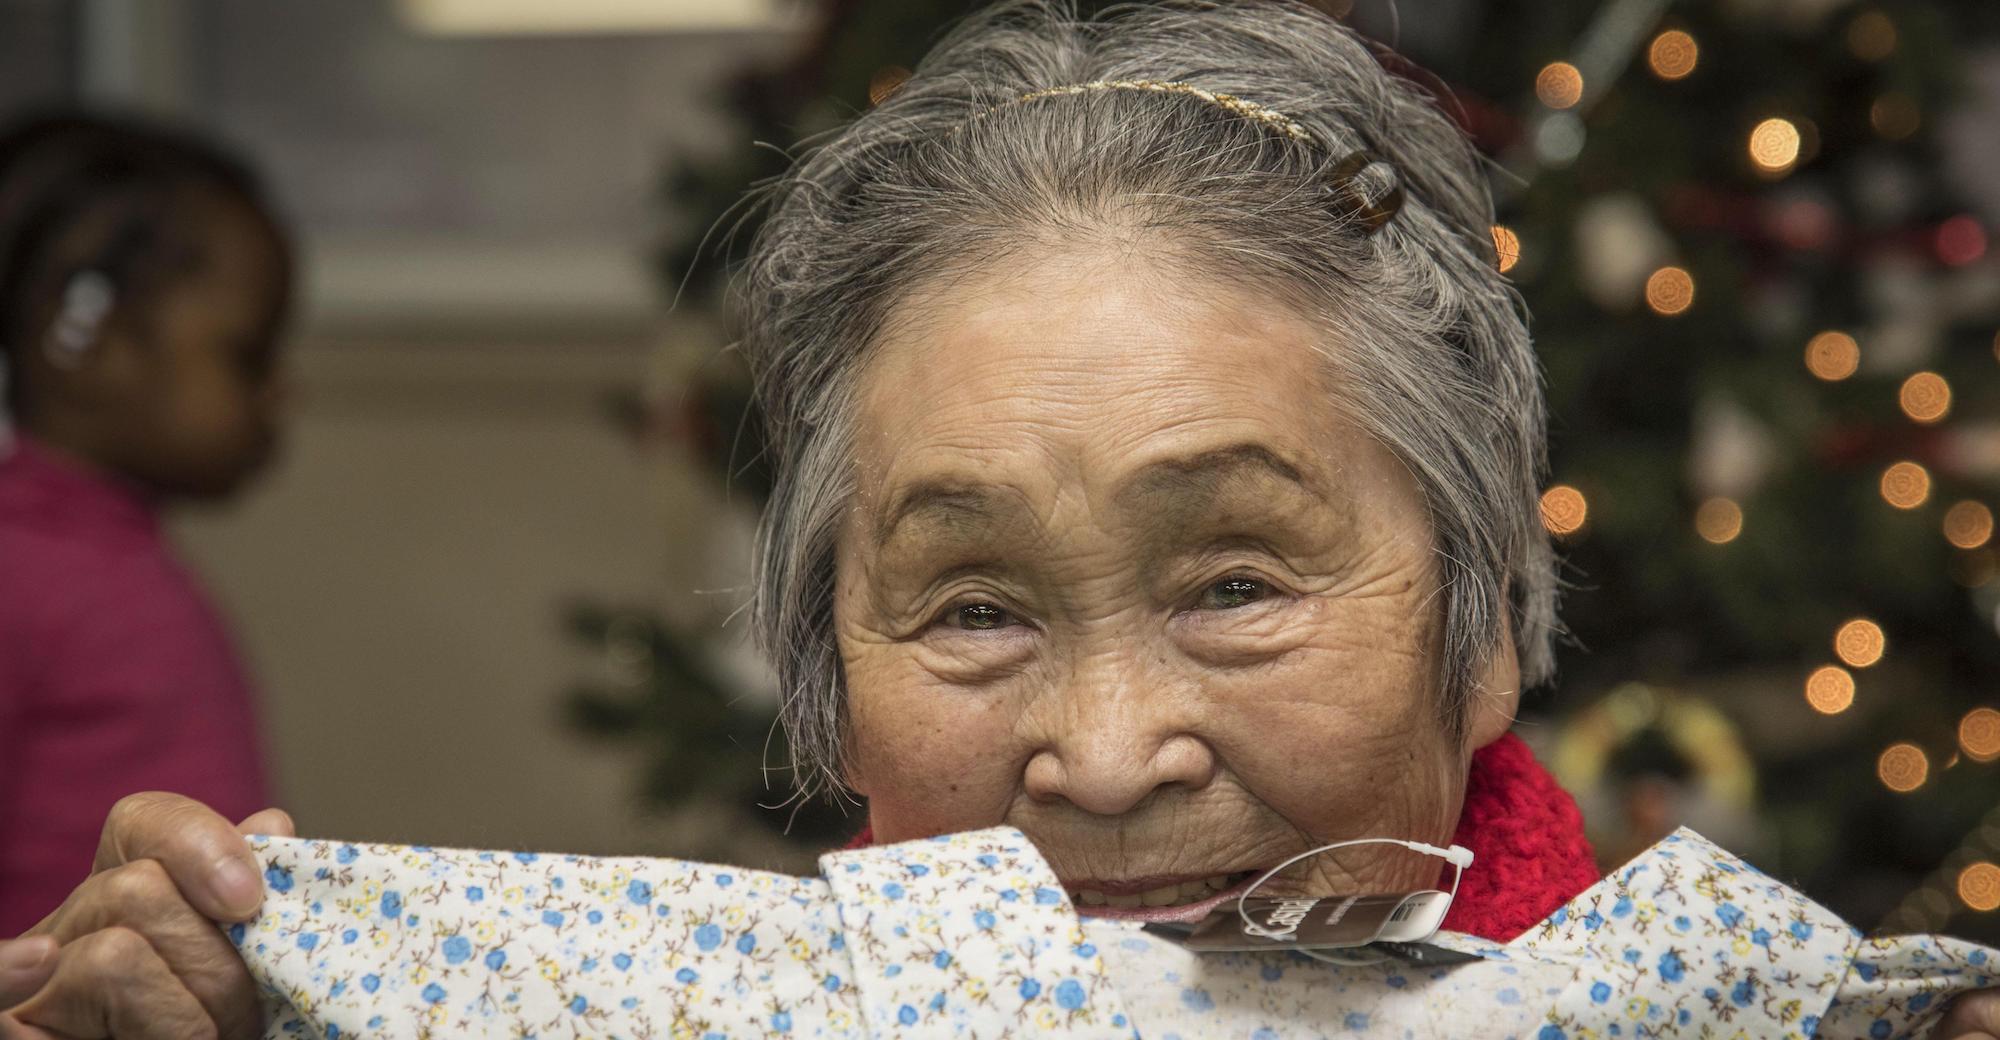 Old People in Japan